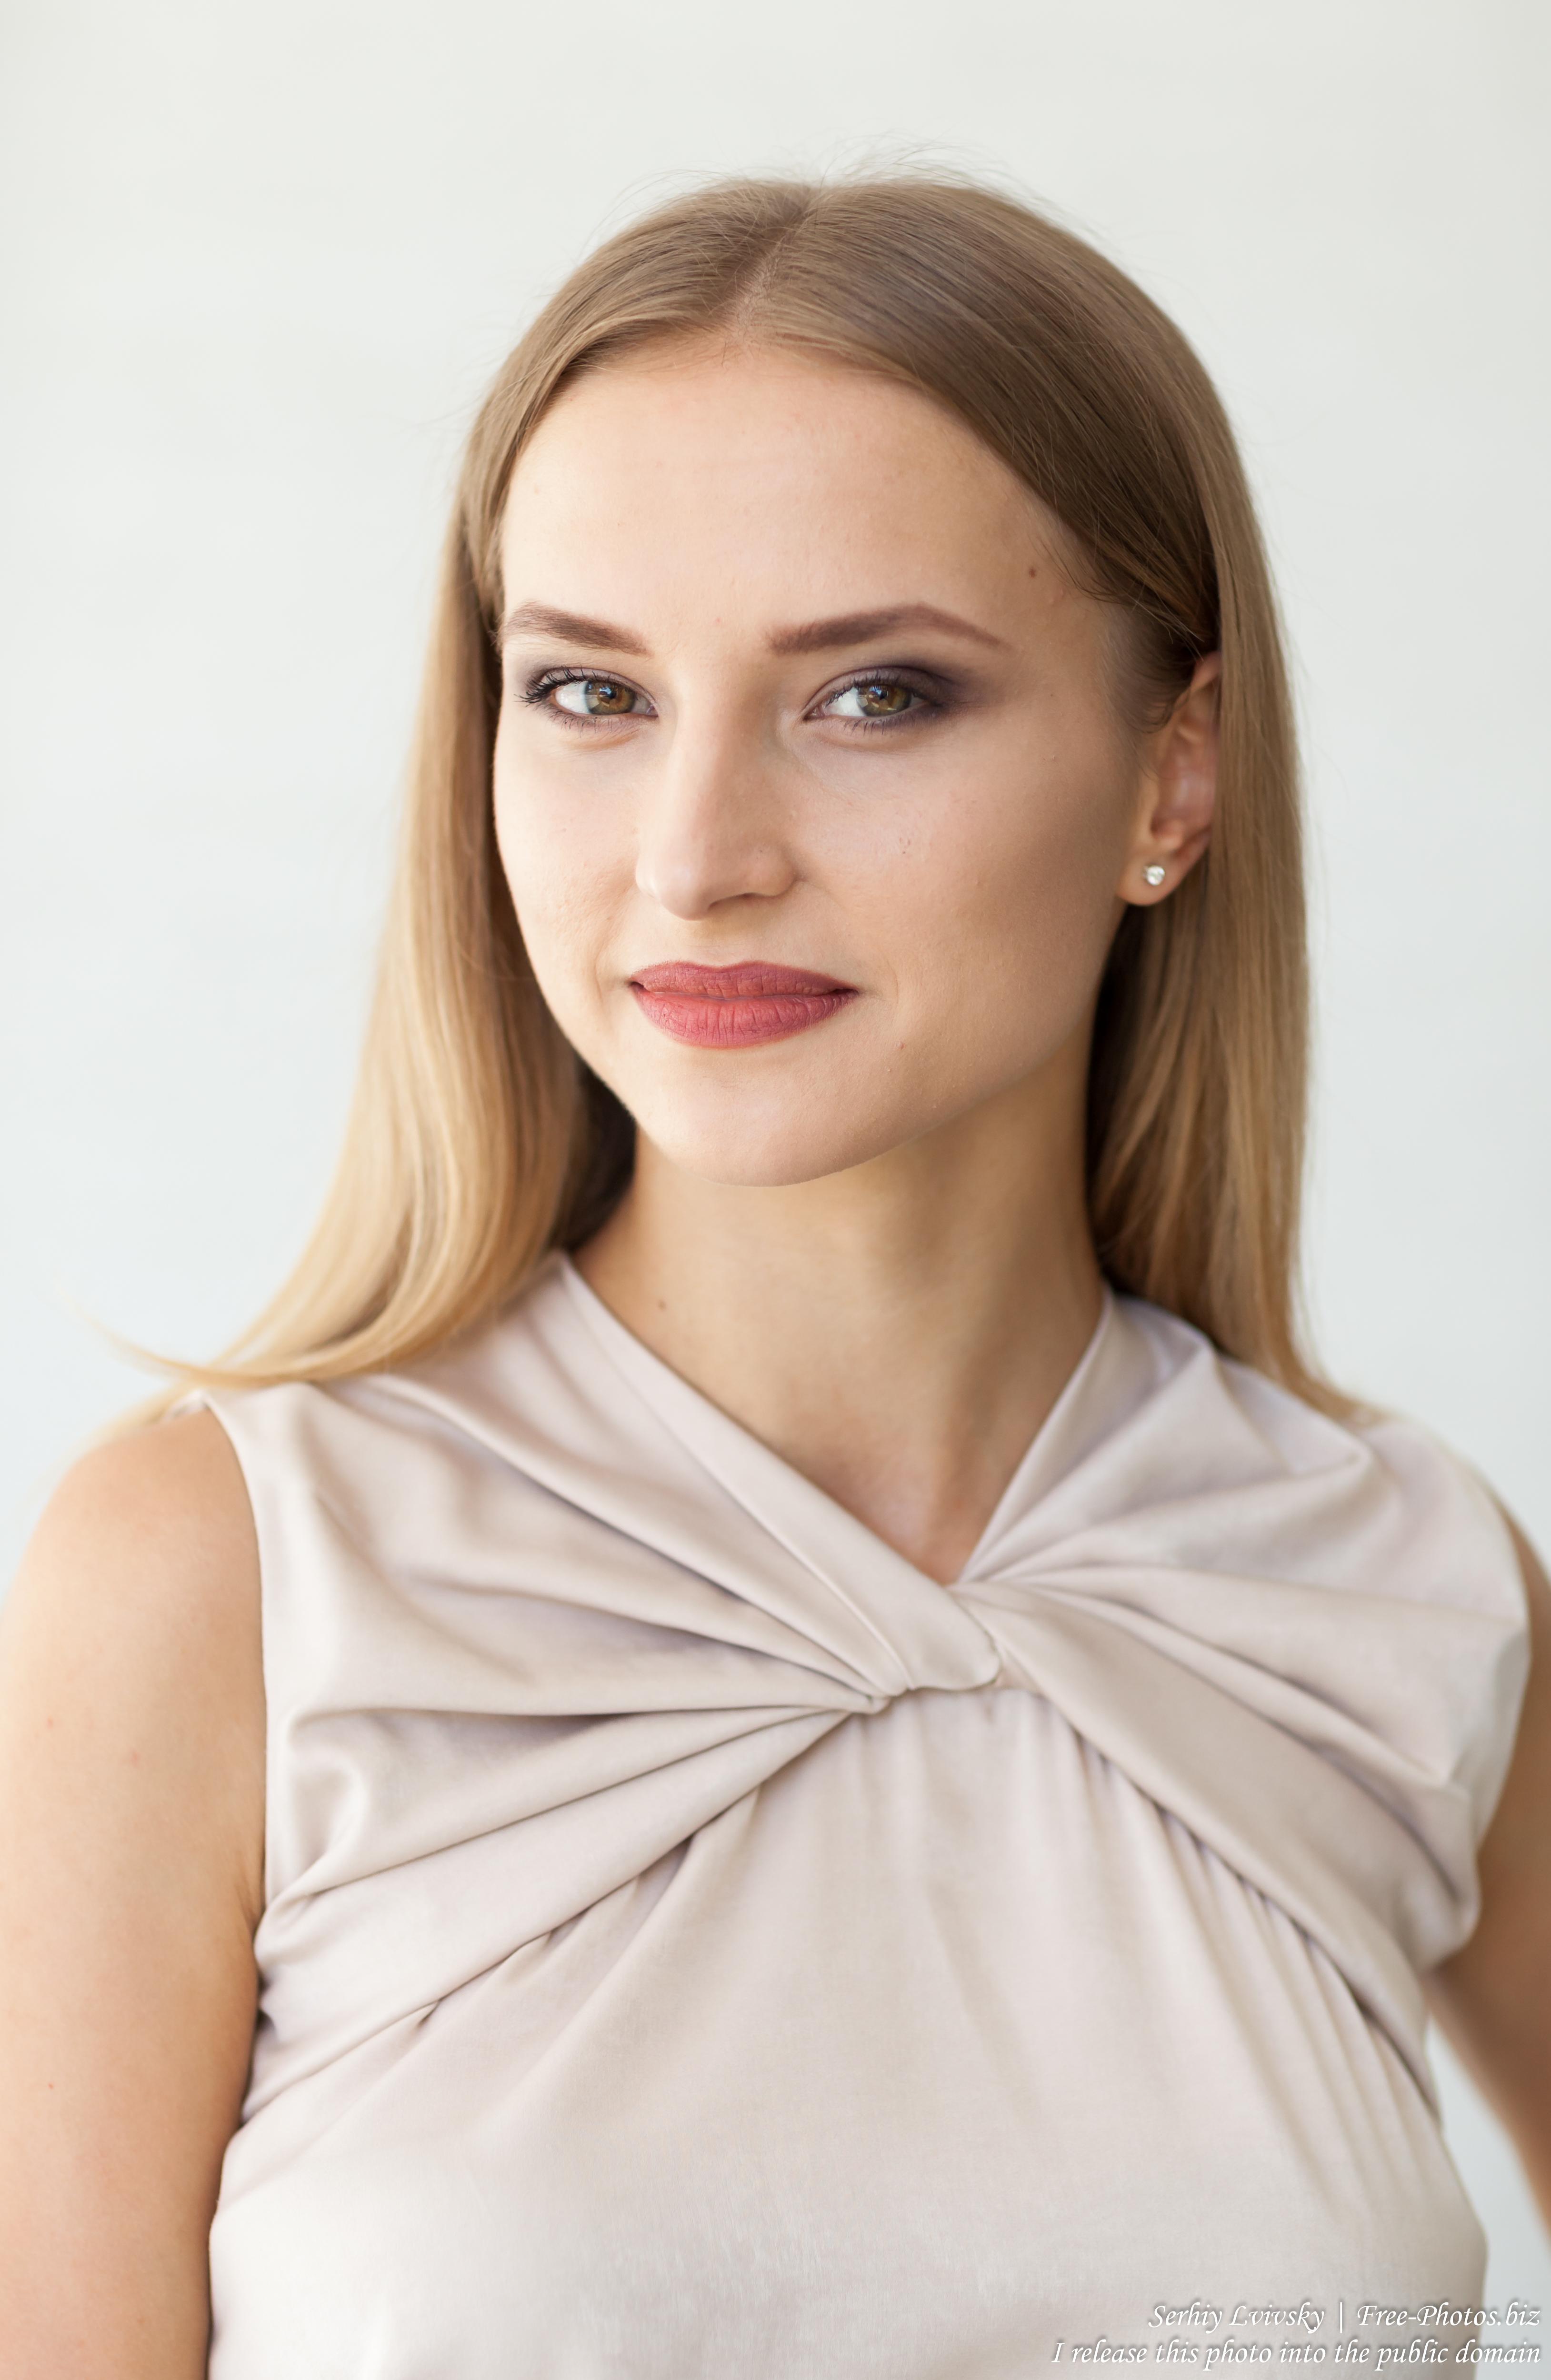 Photo of Marta - a 21-year-old natural blonde Catholic